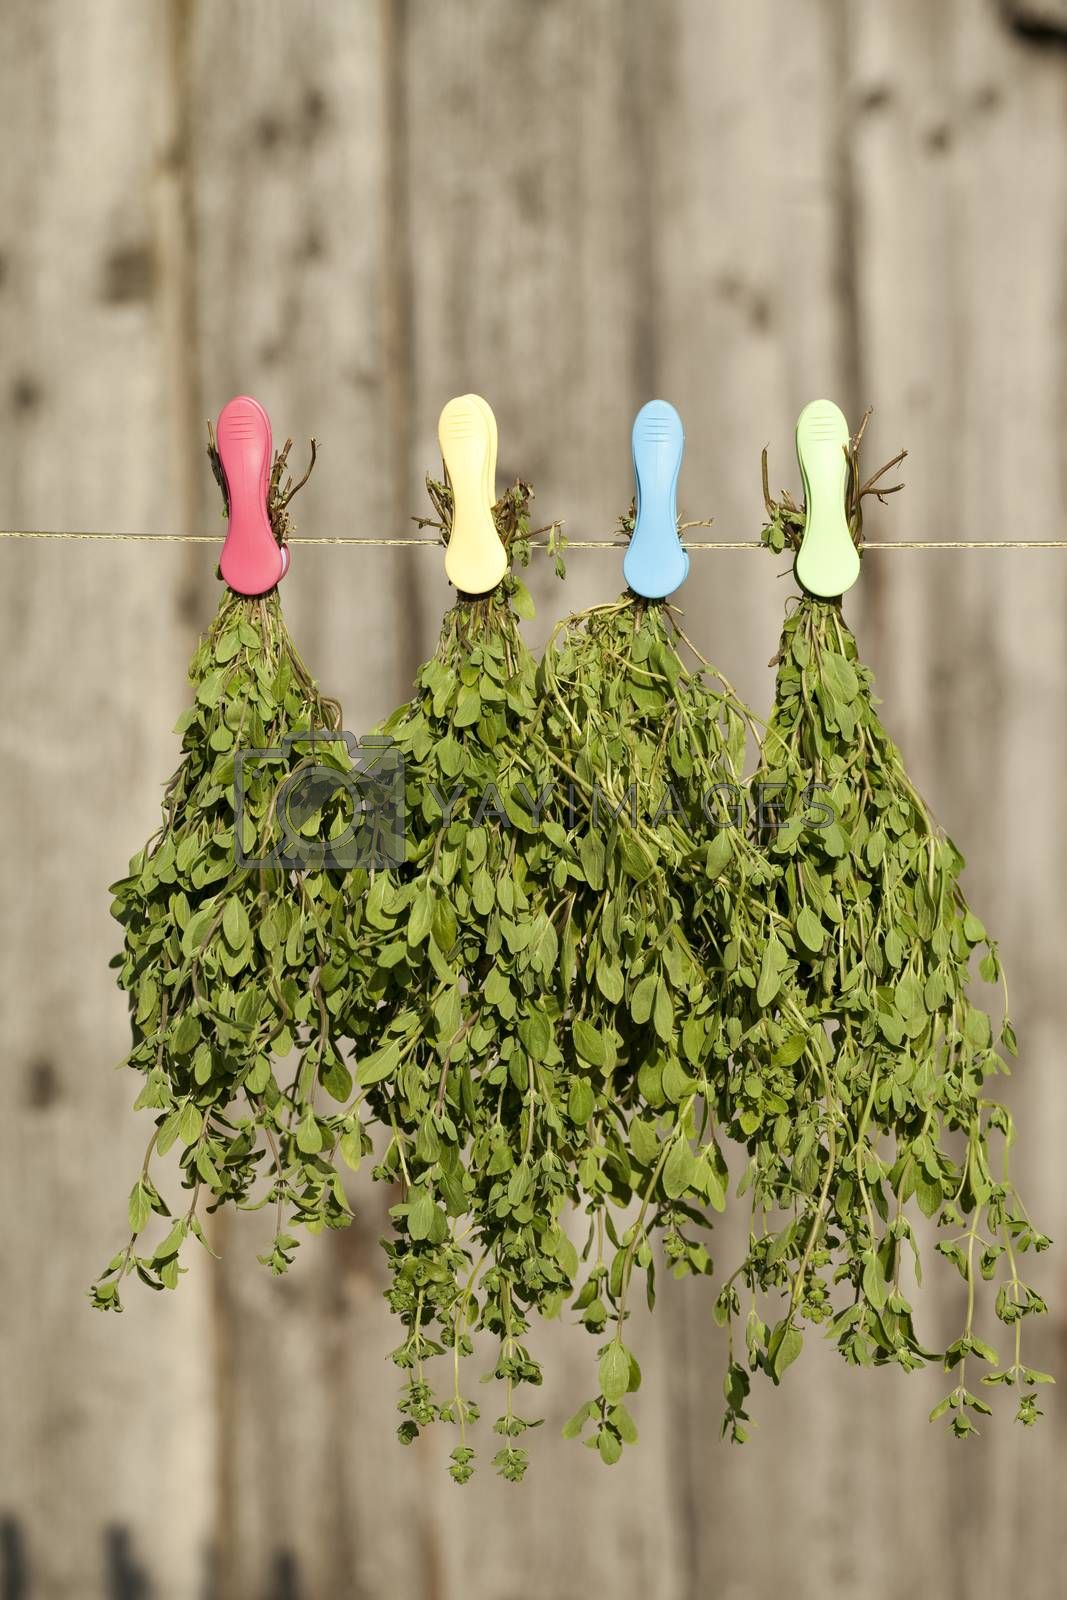 fresh marjoram (Origanum majorana) hang on string